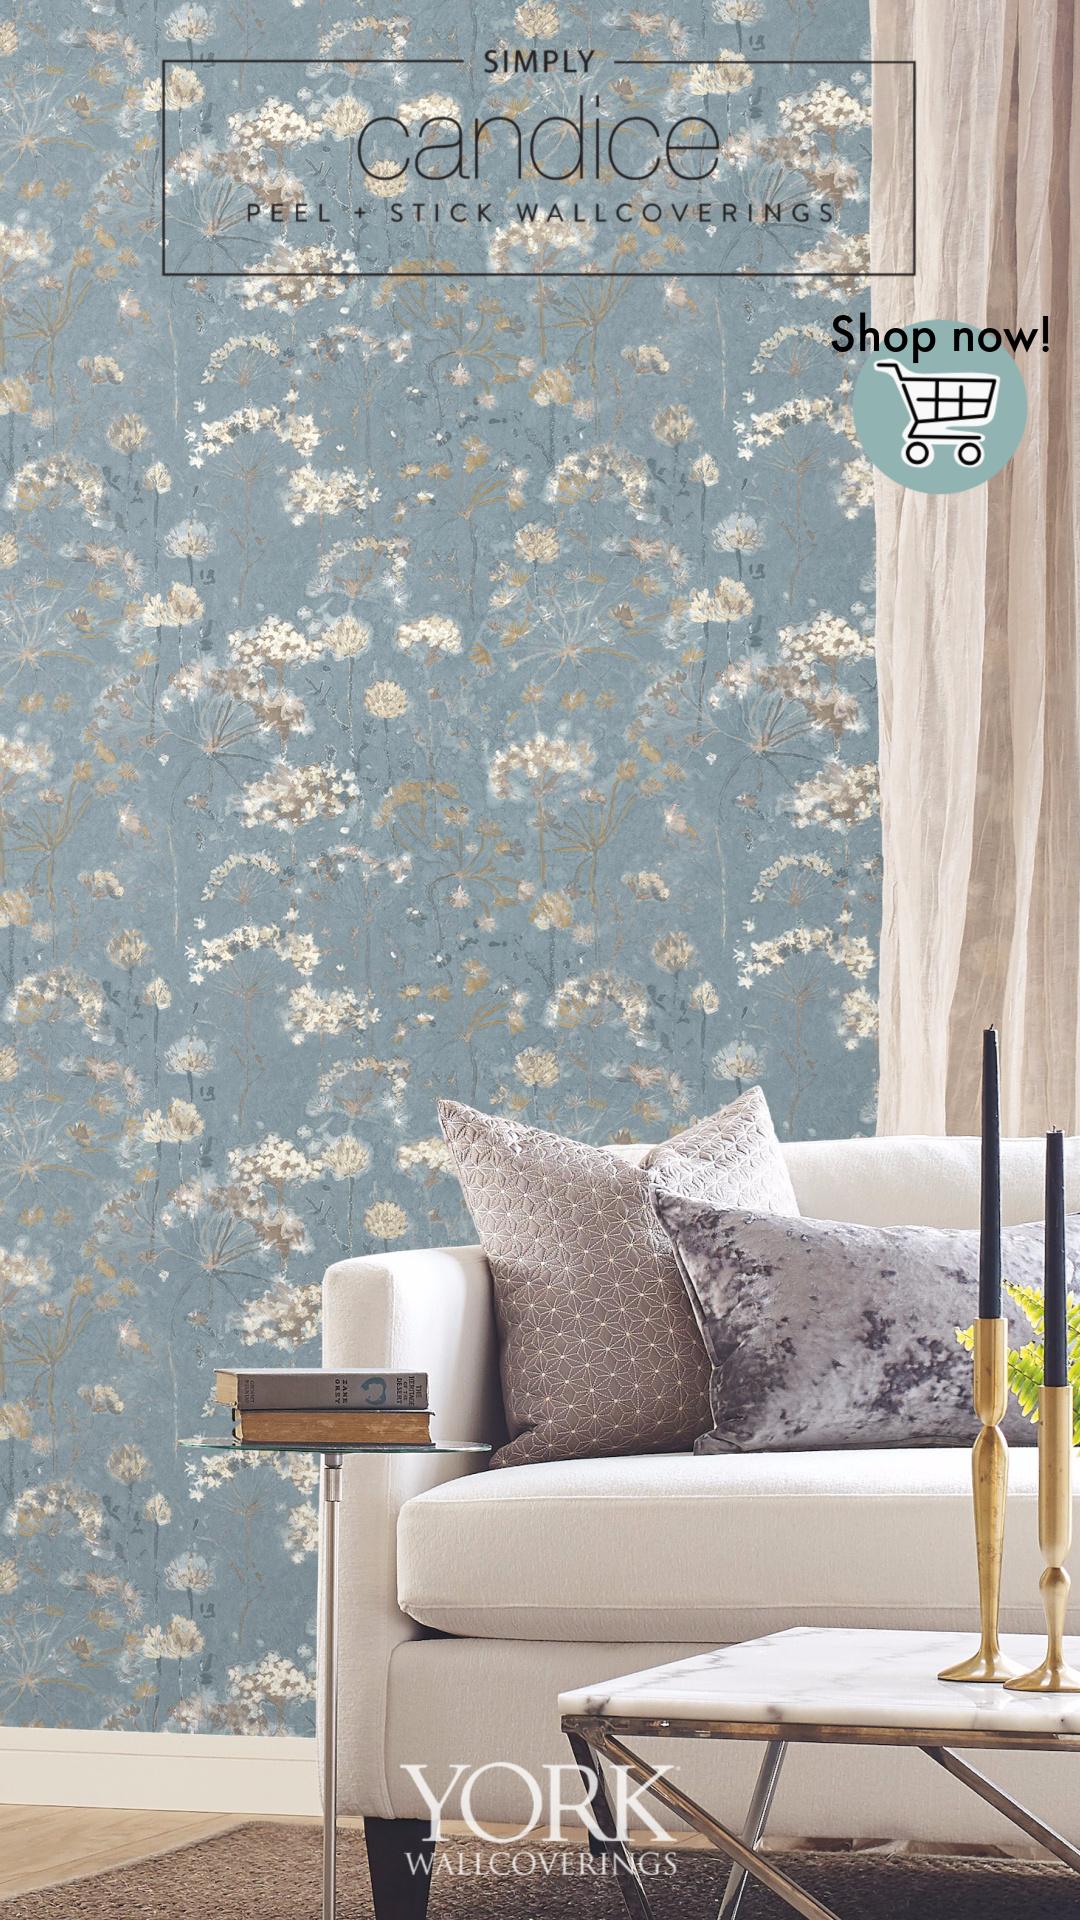 Botanical Fantasy Premium Peel And Stick Wallpaper Peel And Stick Wallpaper Wall Coverings Wallpaper Roll